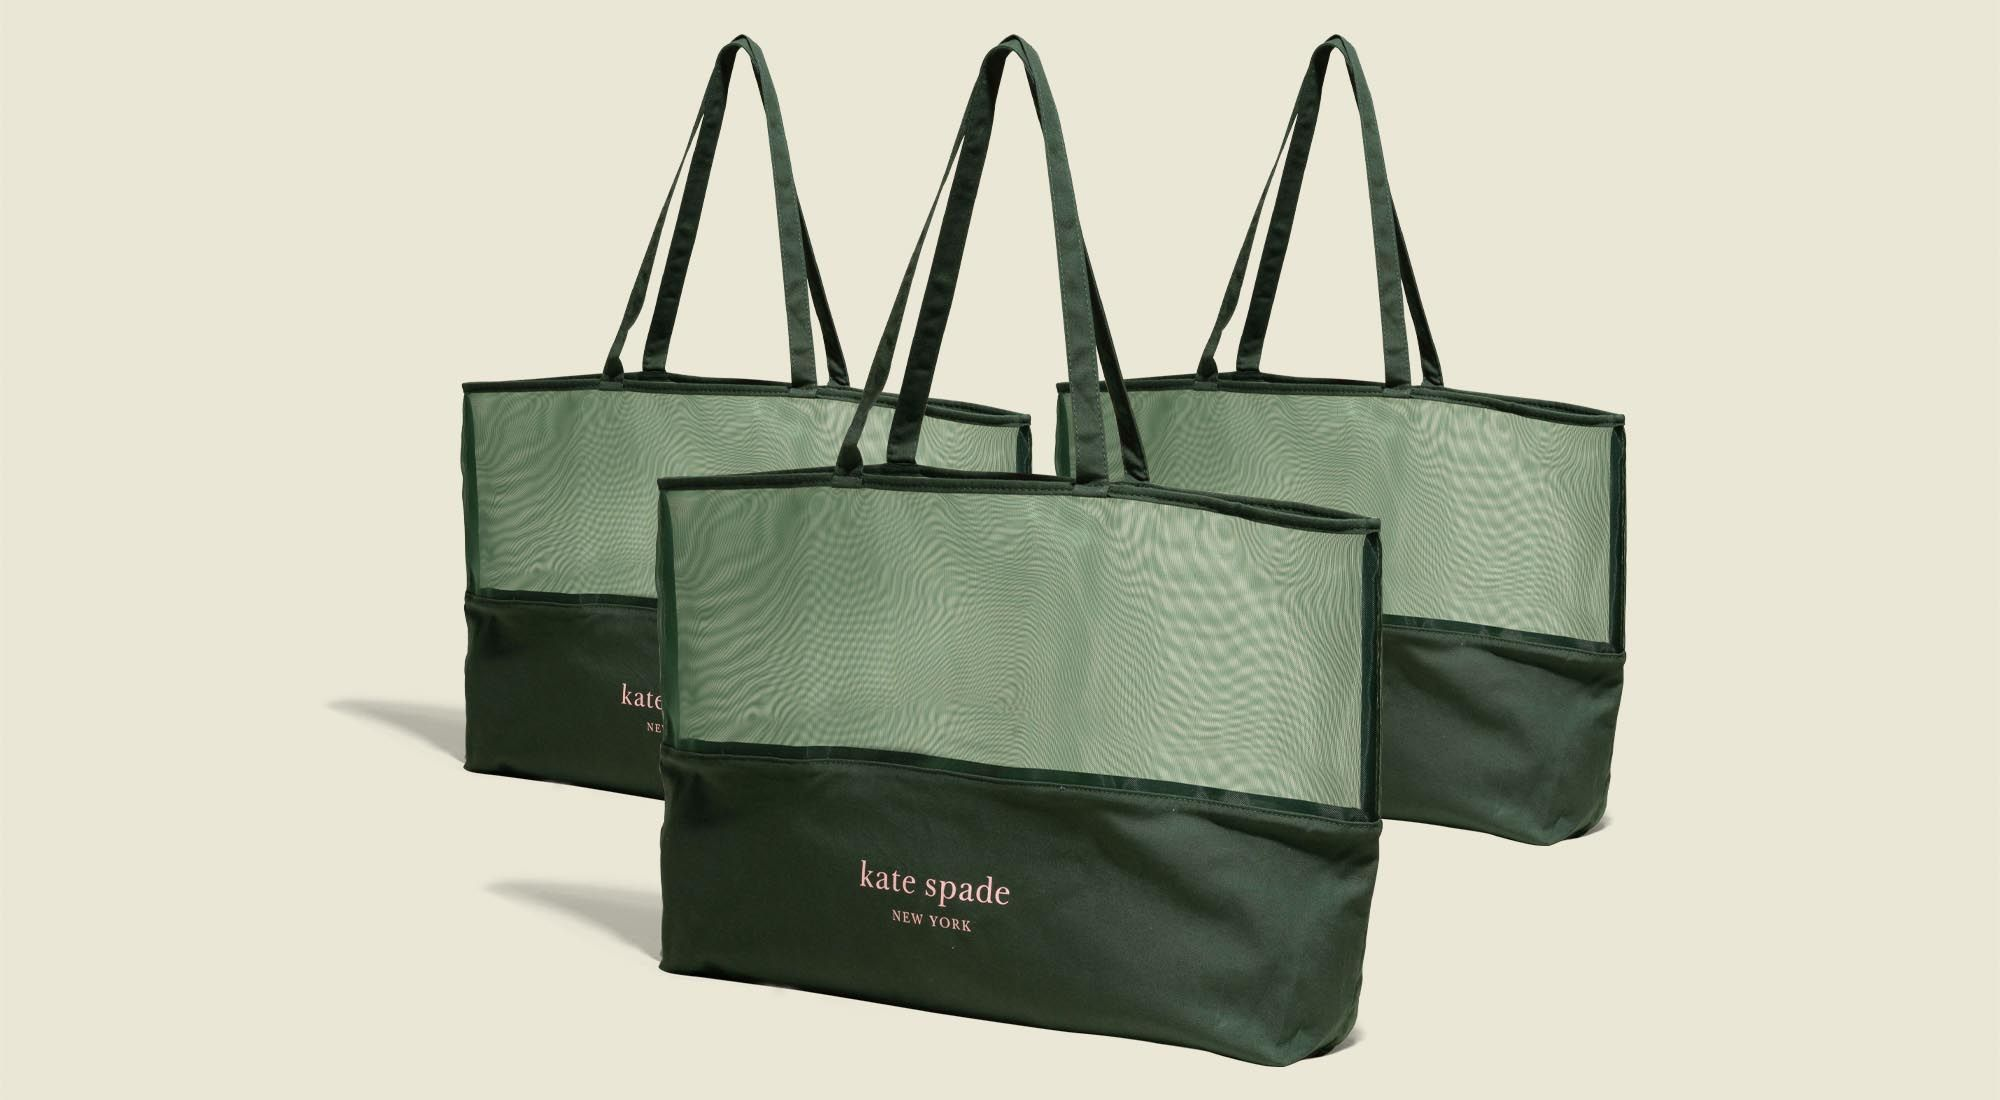 Three tote bags